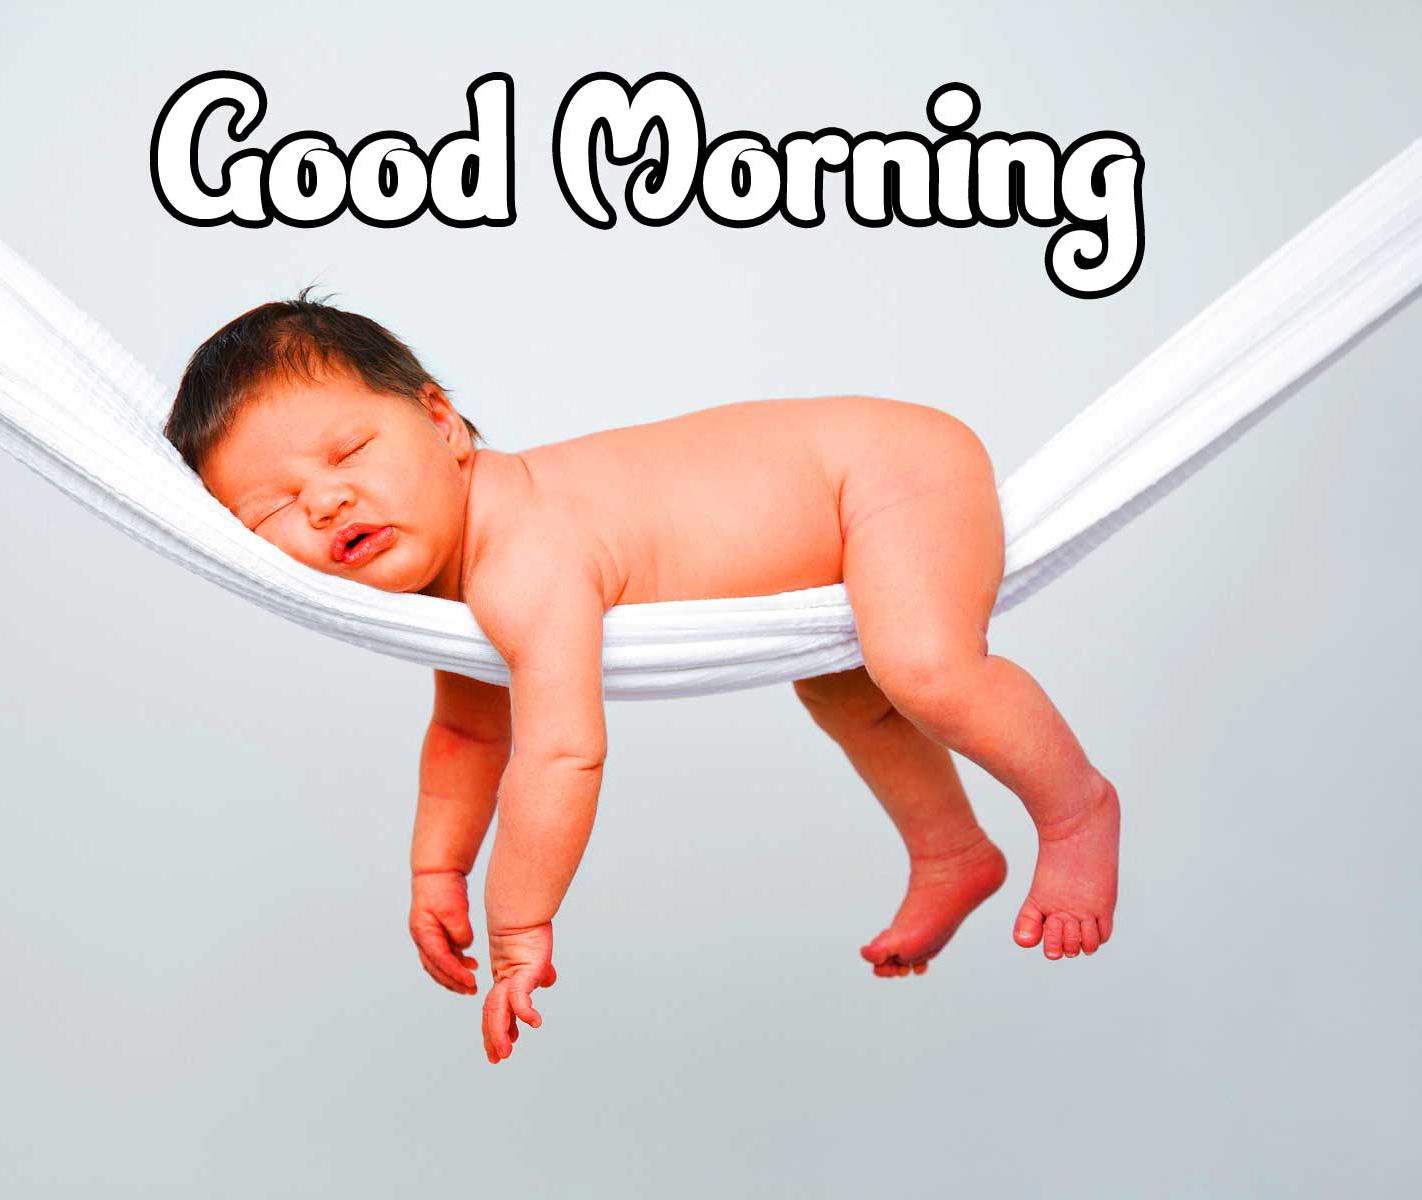 Good Morning Small Baby Images Pics Wallpaper HD